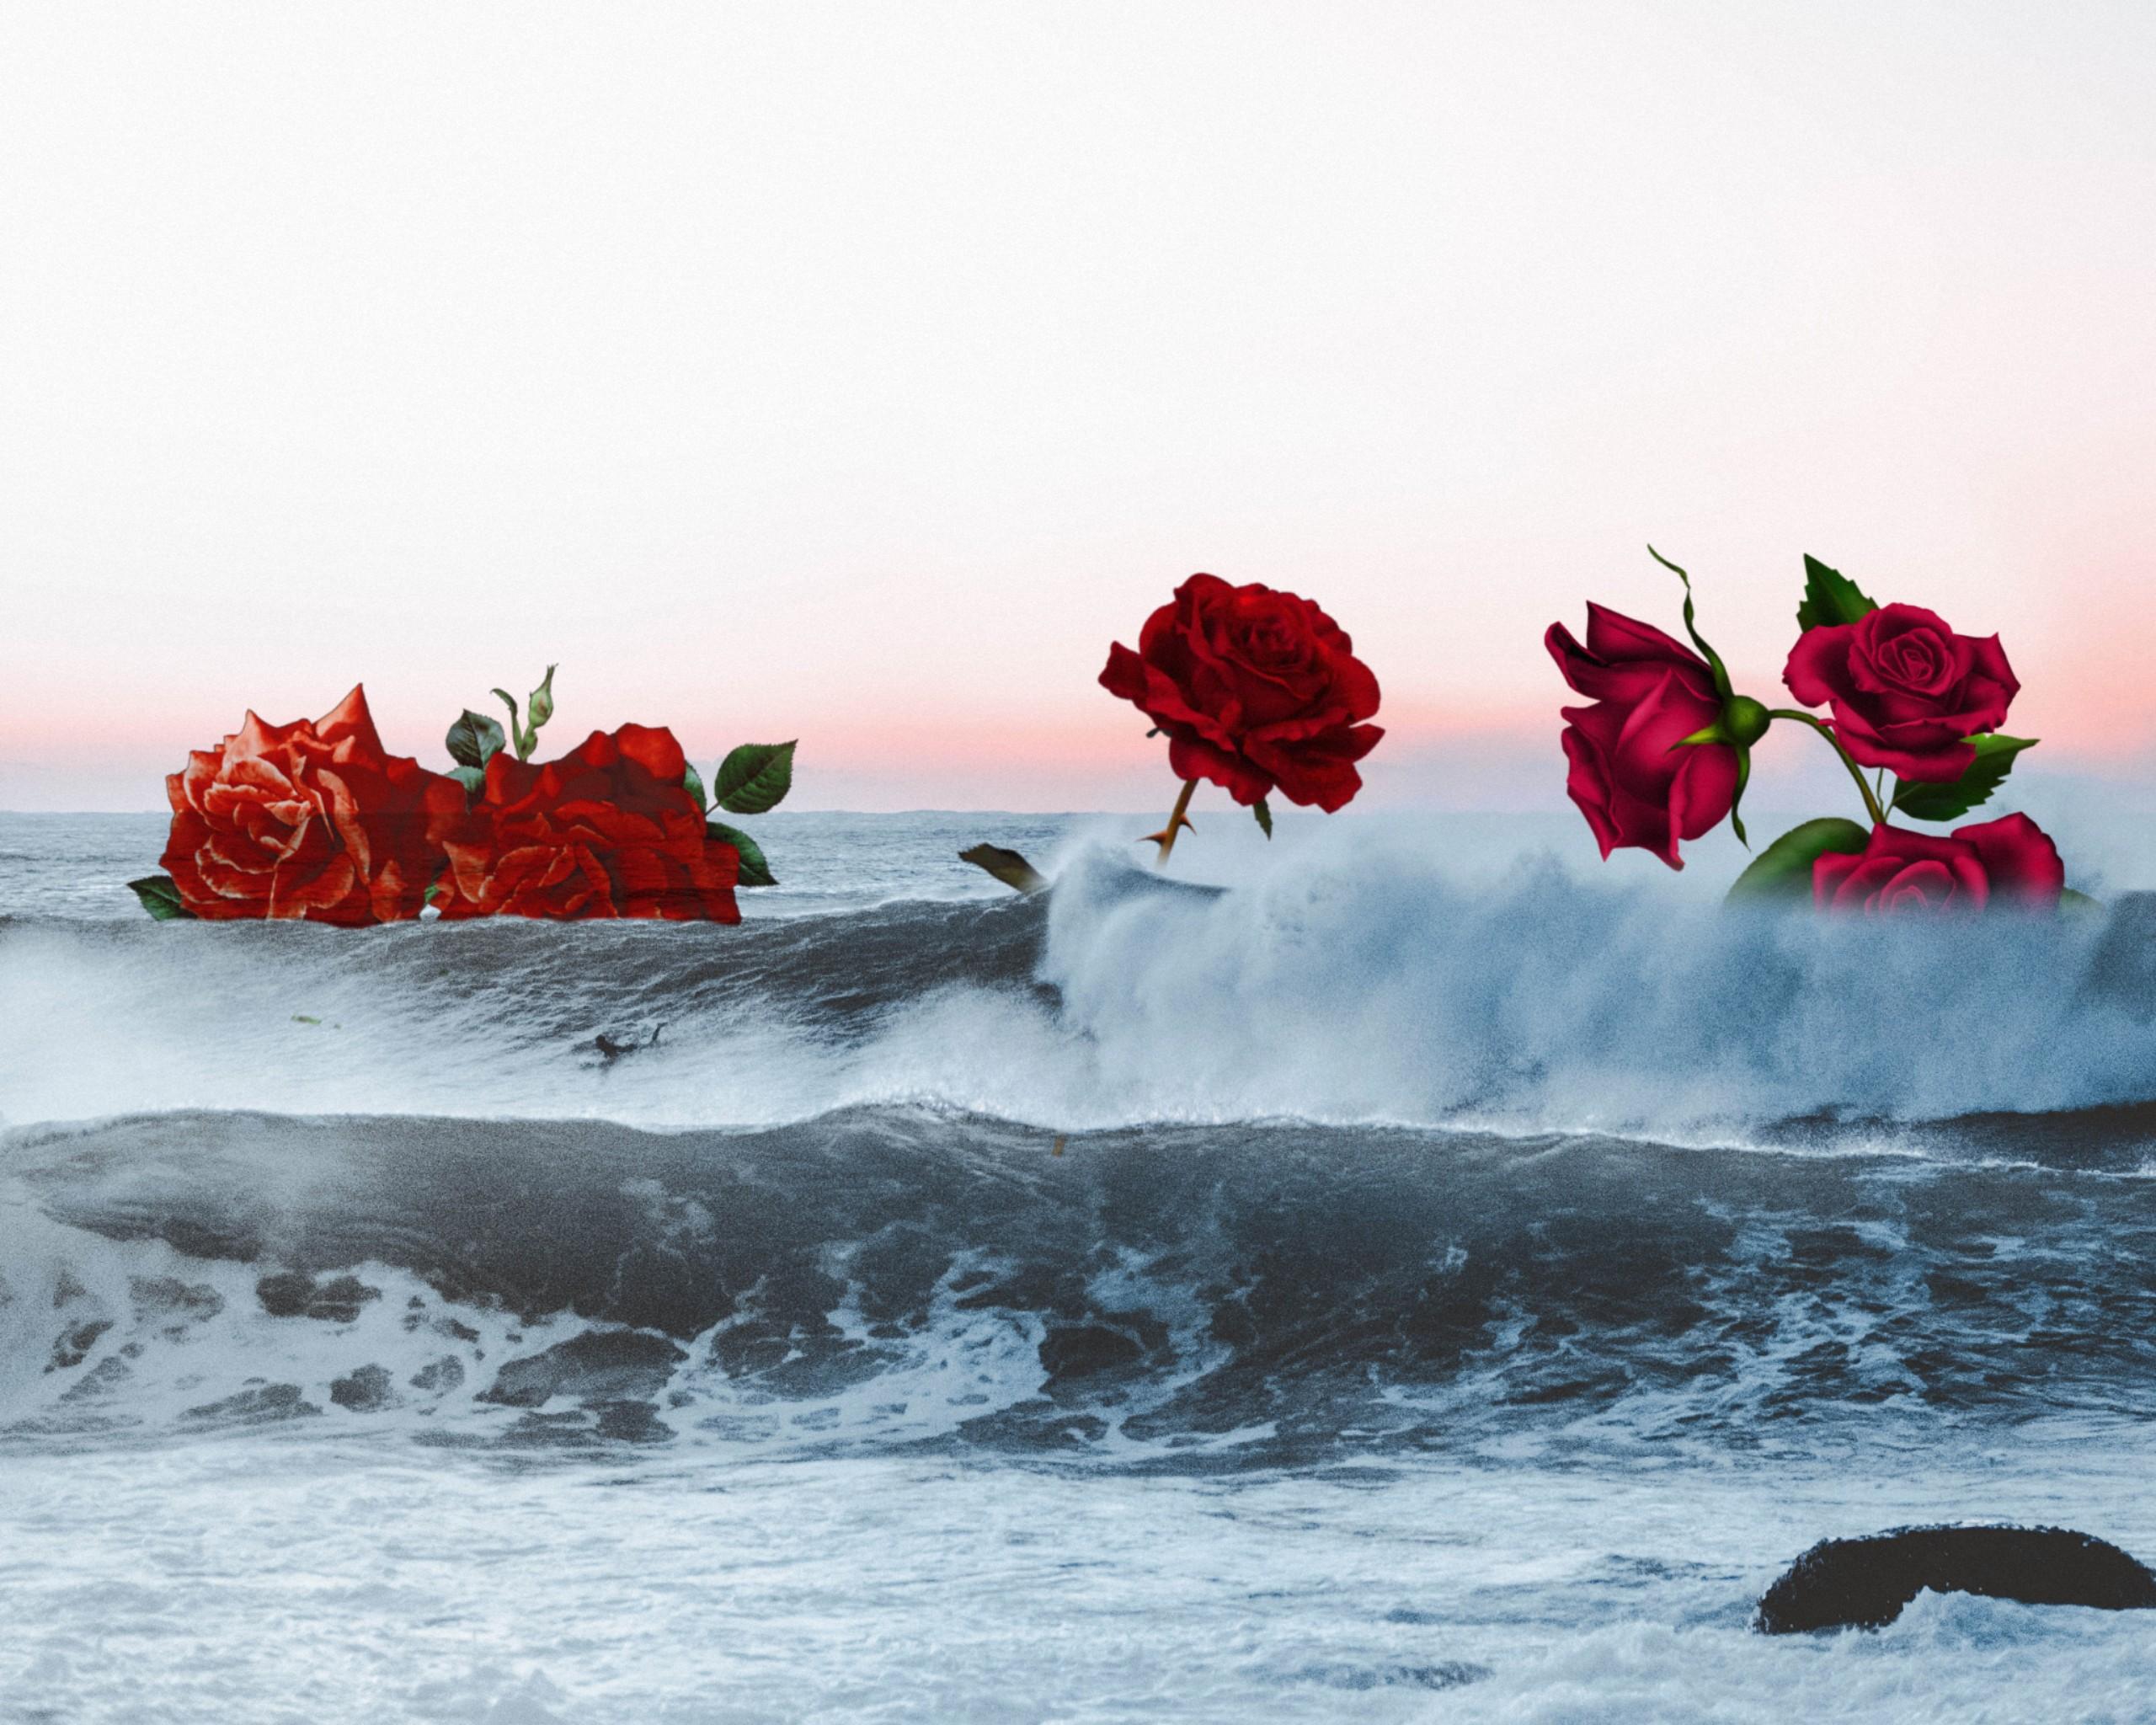 #freetoedit #rose #sea #ocean